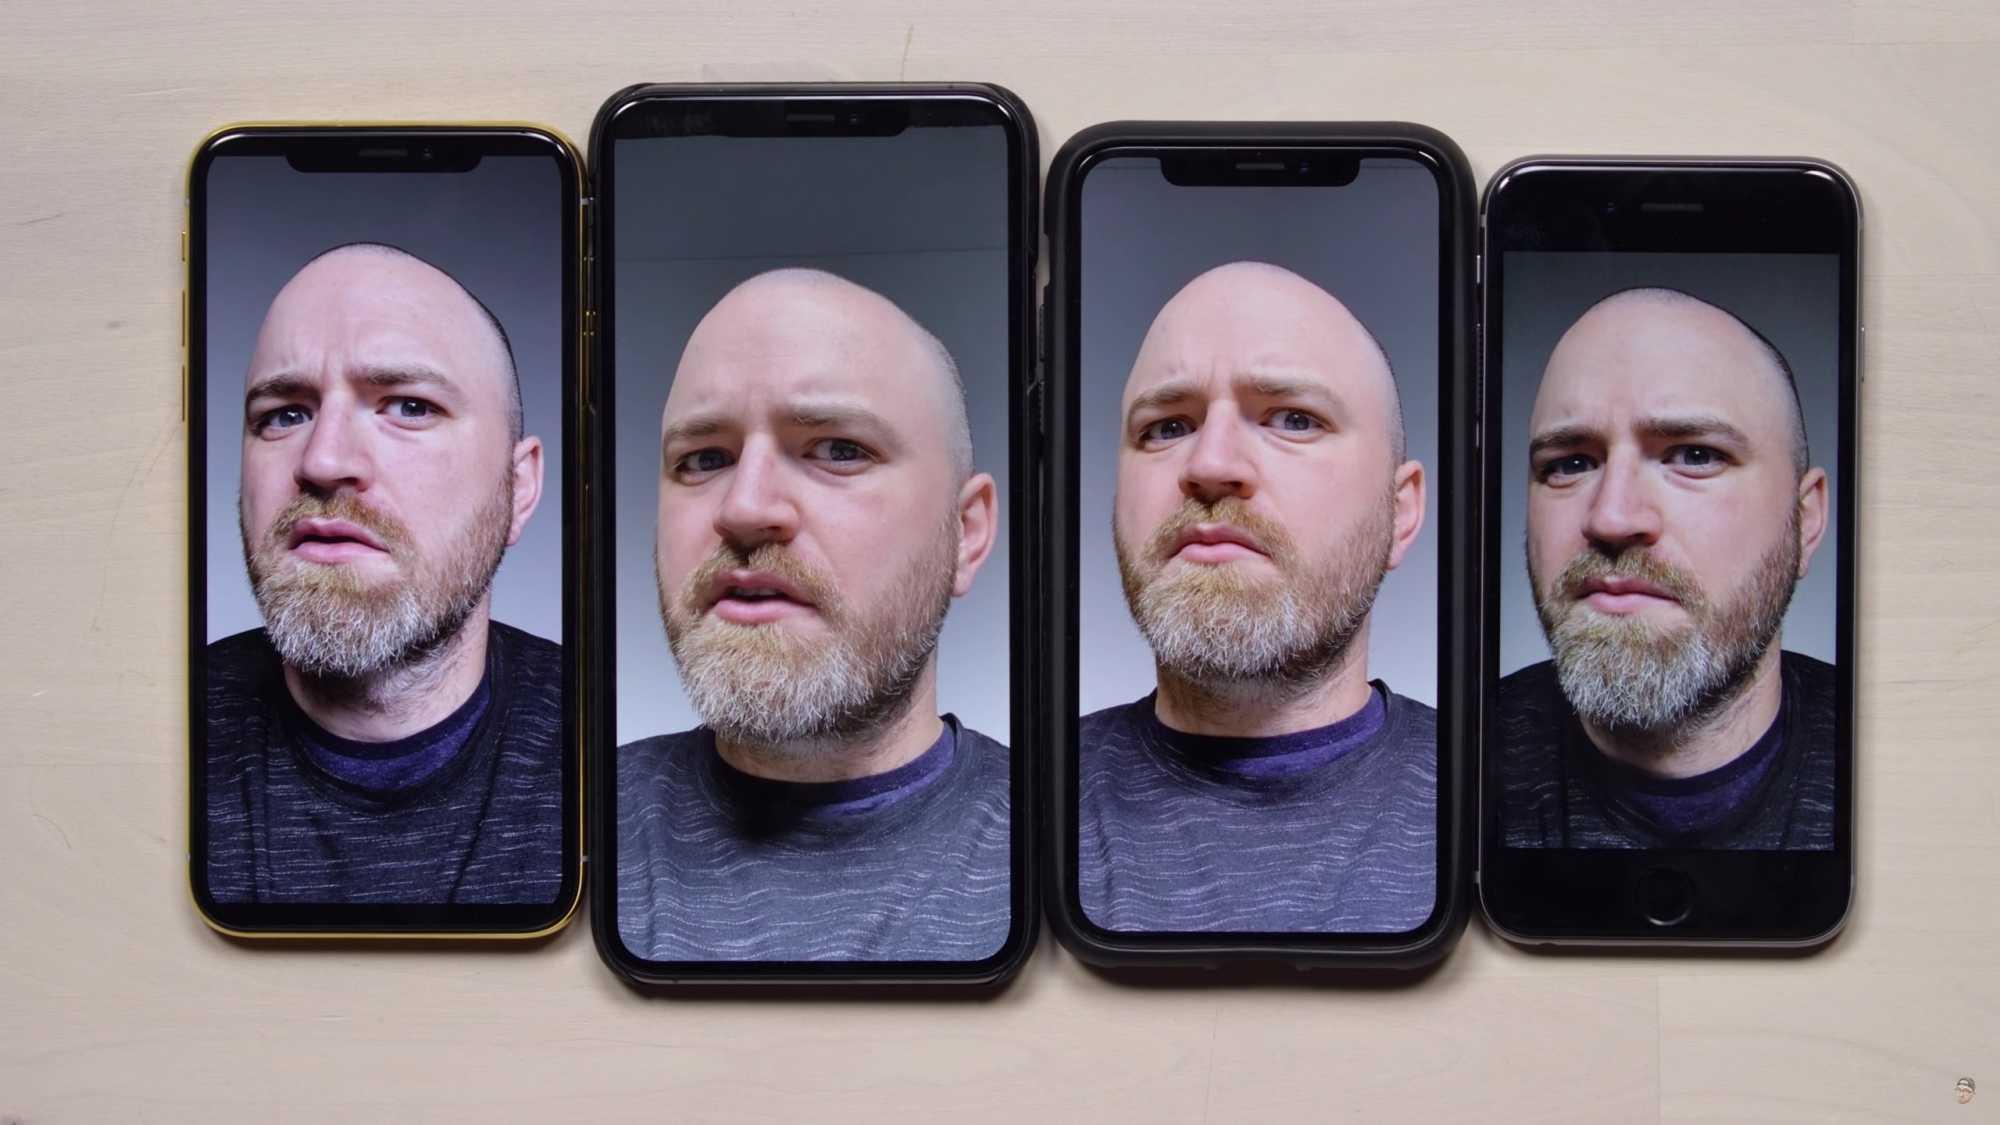 iPhone XS und iPhone XS Max in der Mitte, iPhone X links, iPhone 6 rechts.